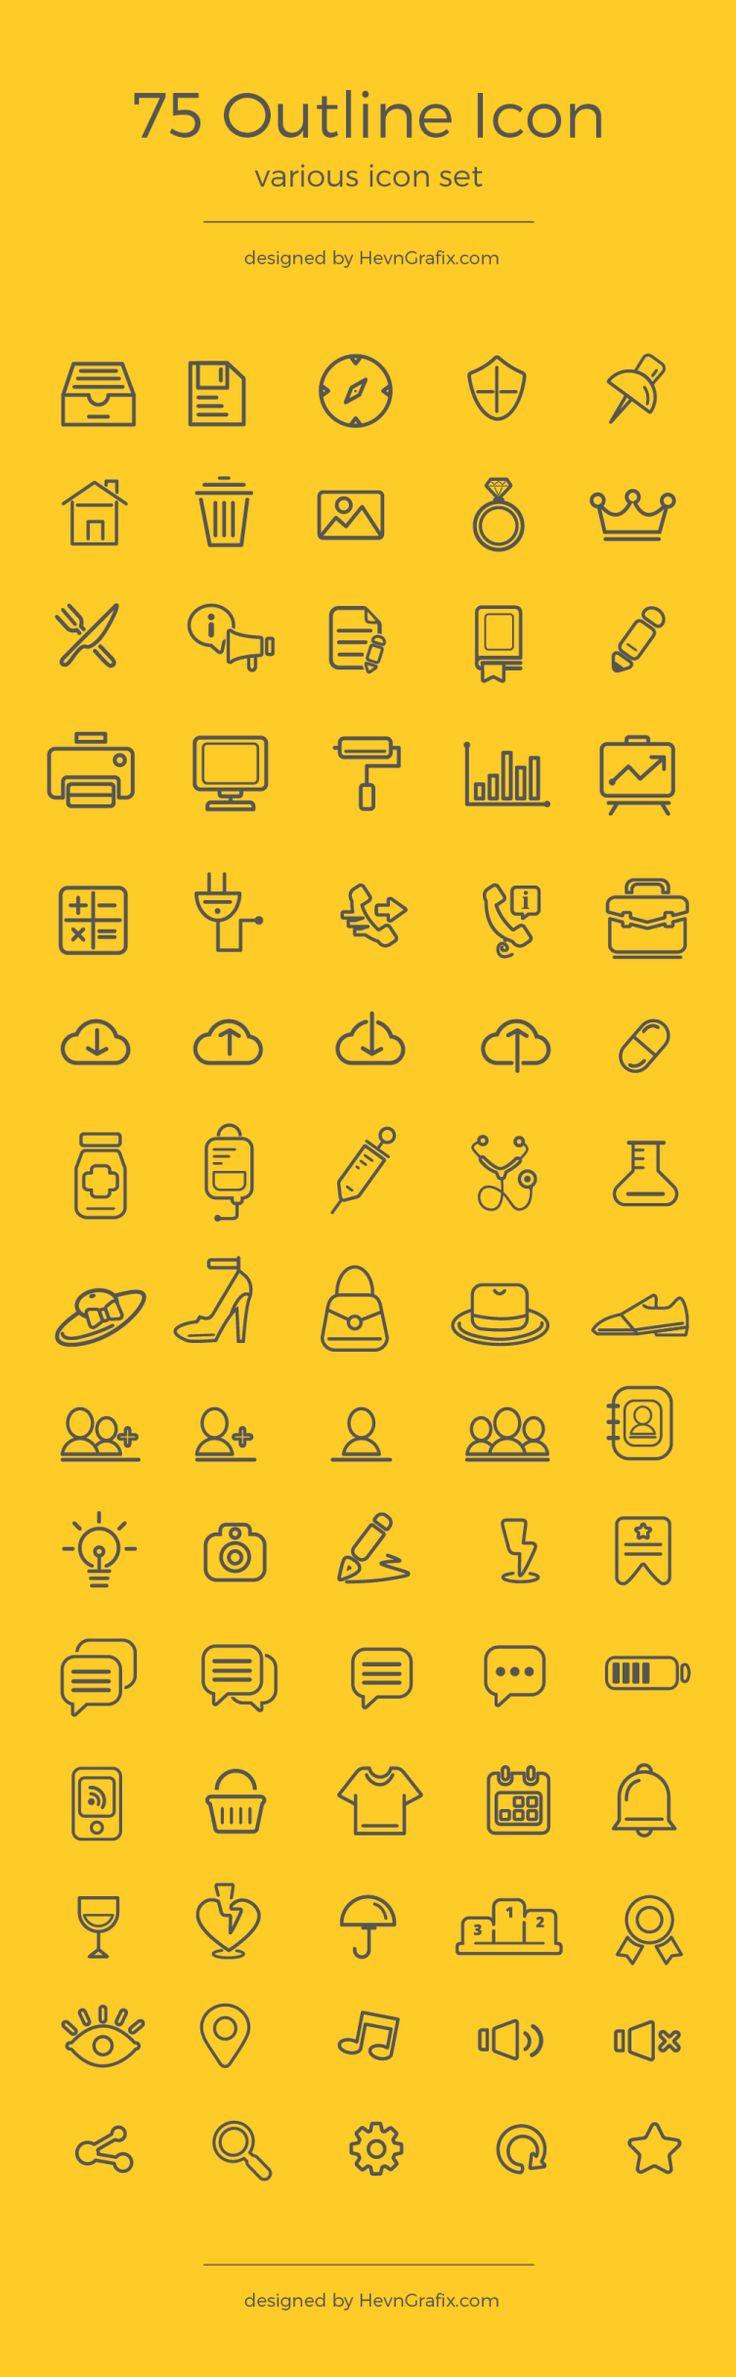 75 Various Outline Icon Set